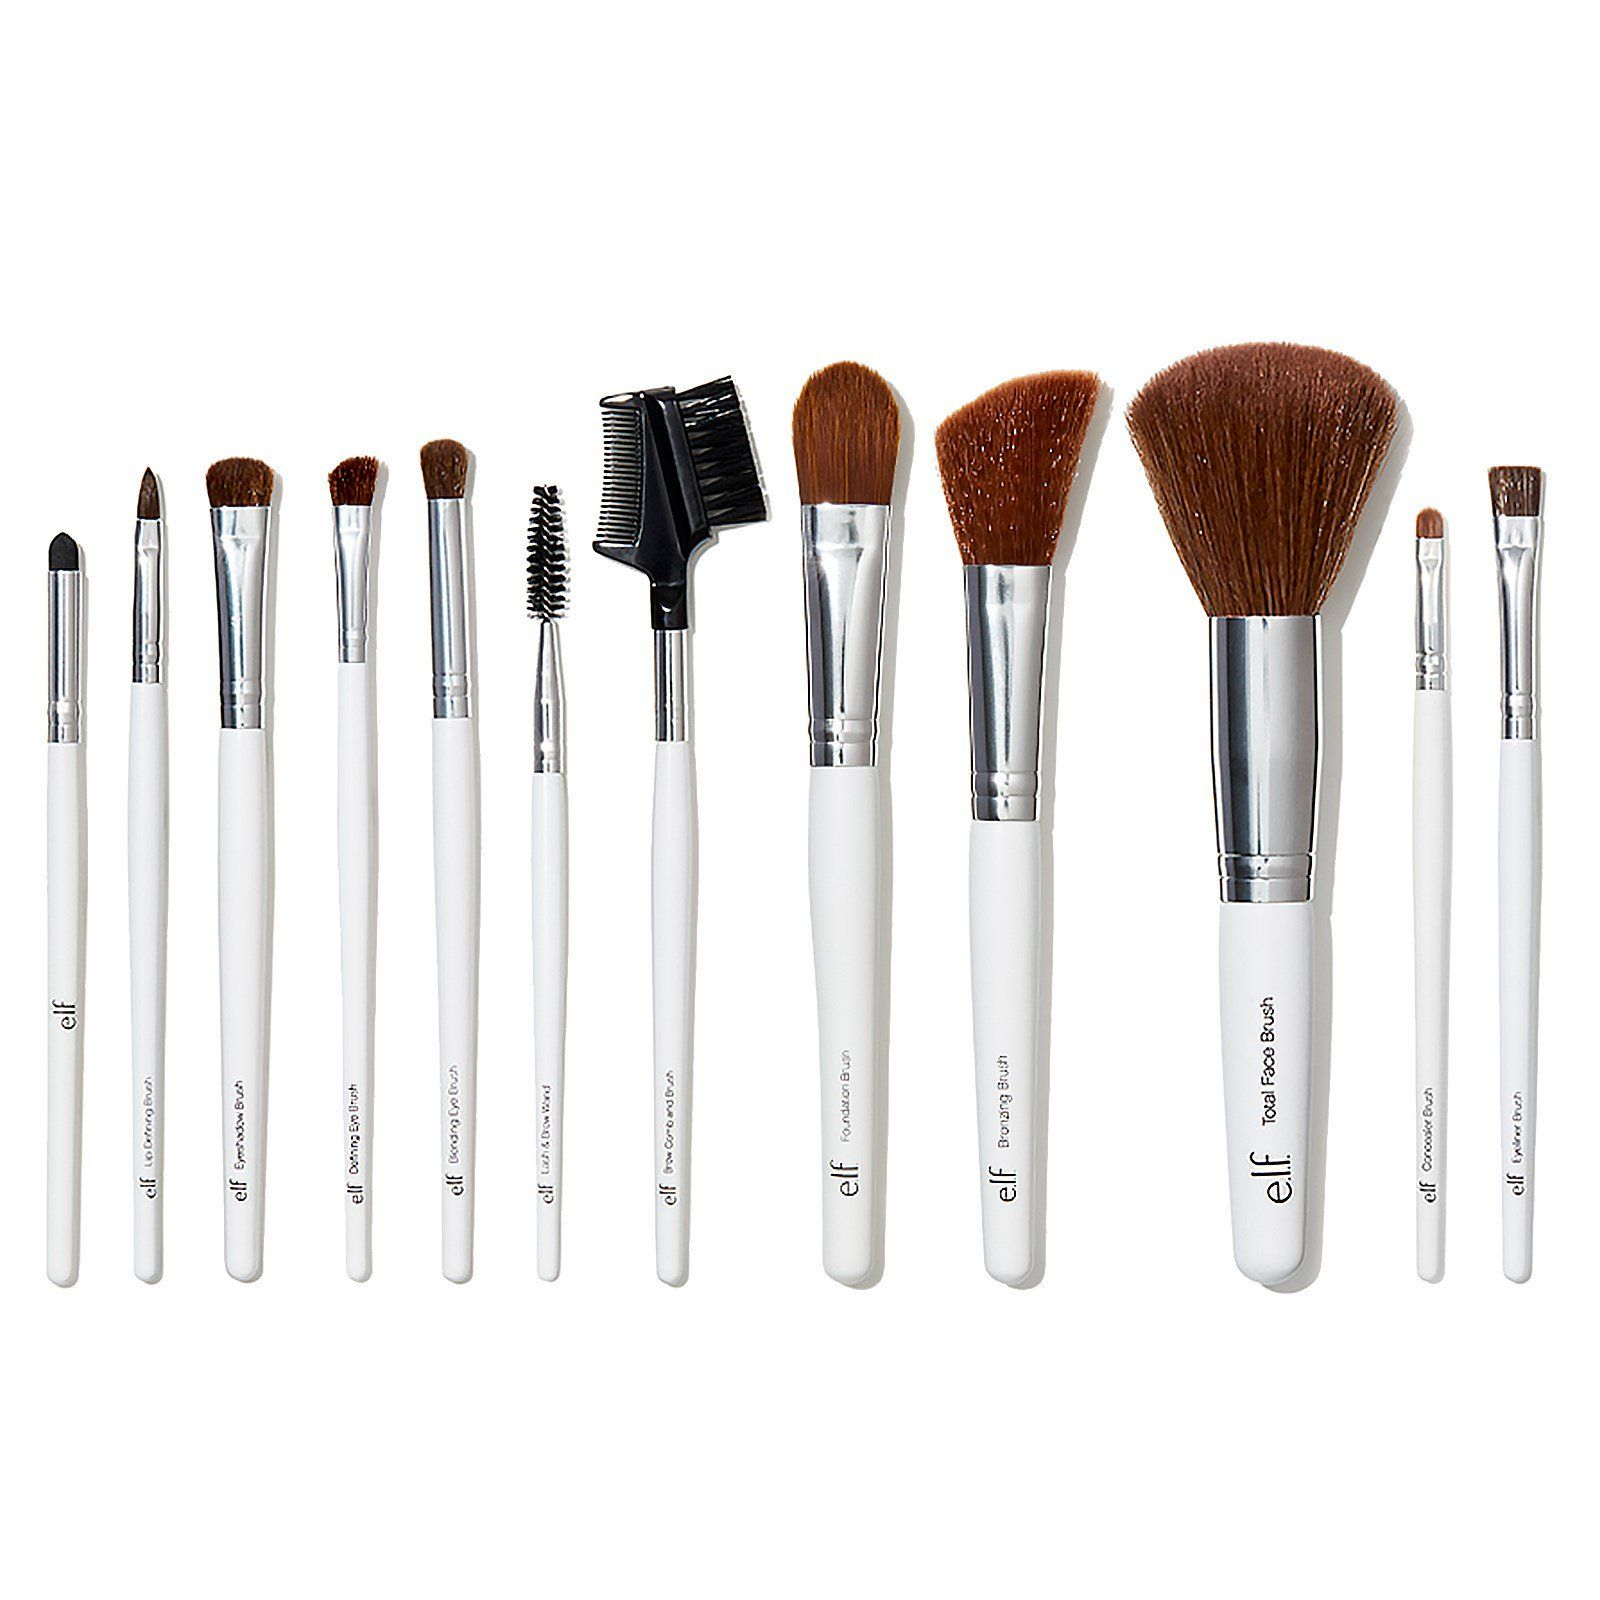 32 piece Professional Makeup Brush Kit Look Love Lust